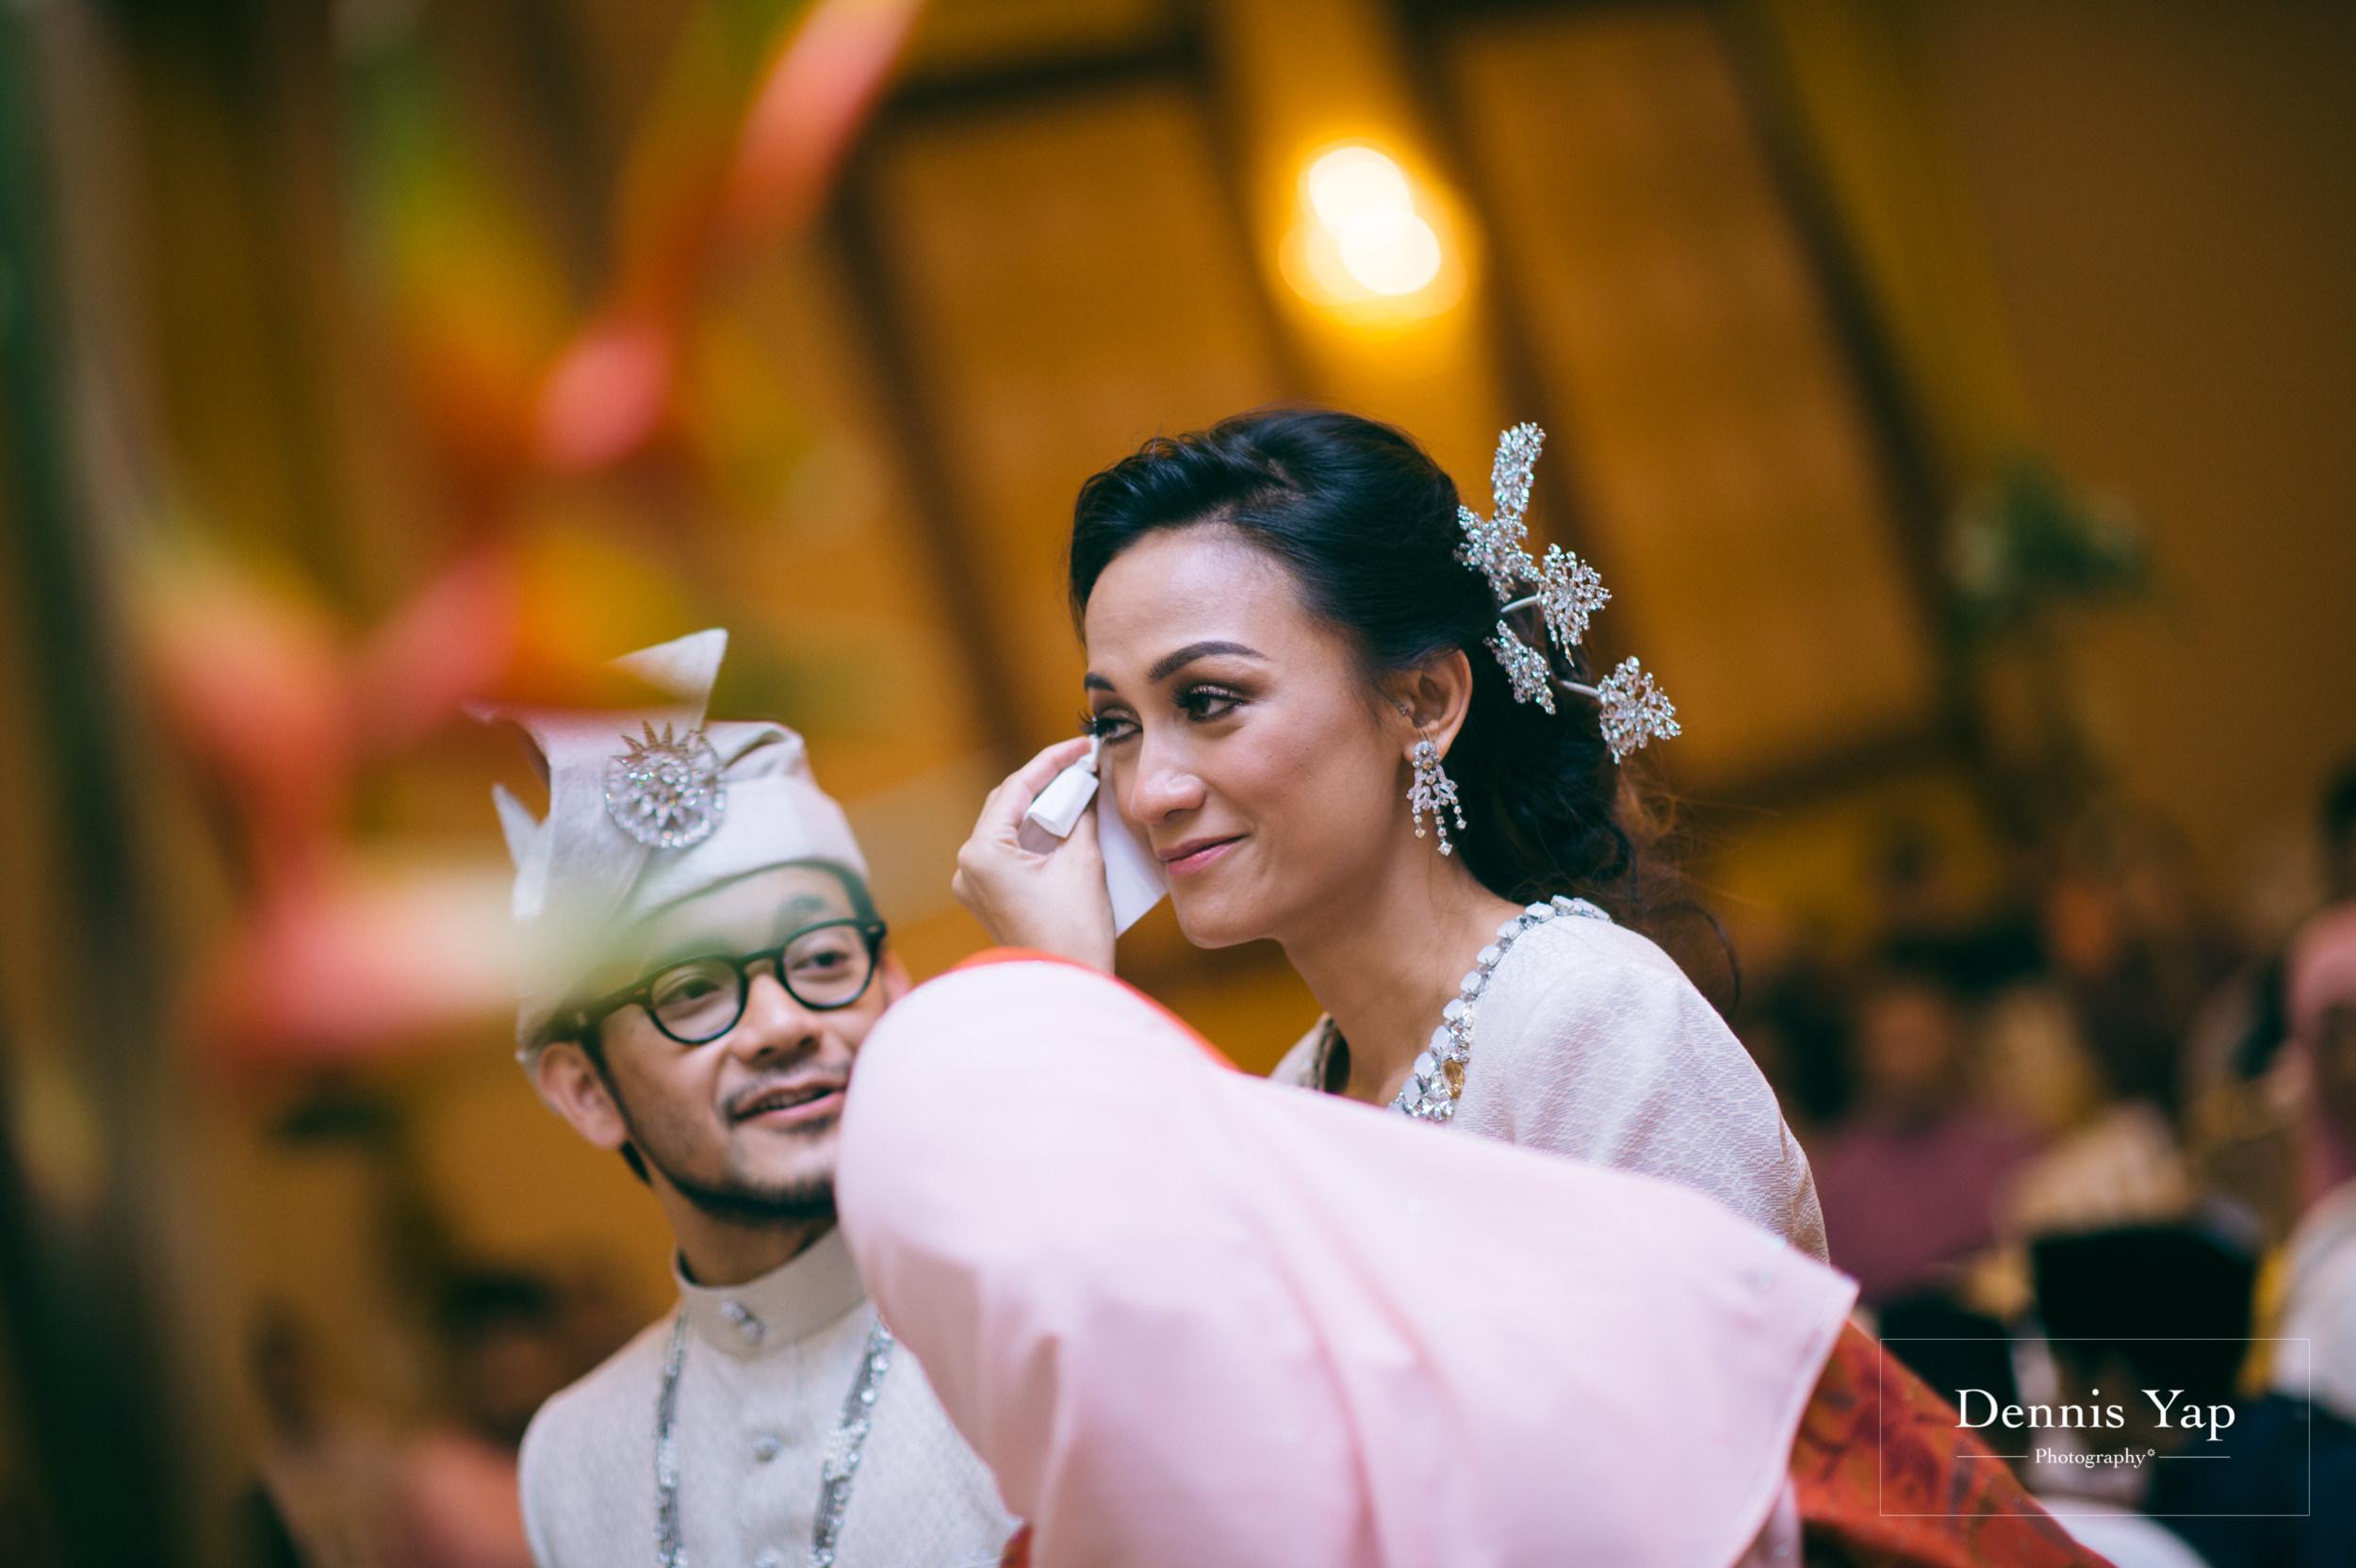 zarif hanalili malay wedding blessing ceremony dennis yap photography-23.jpg